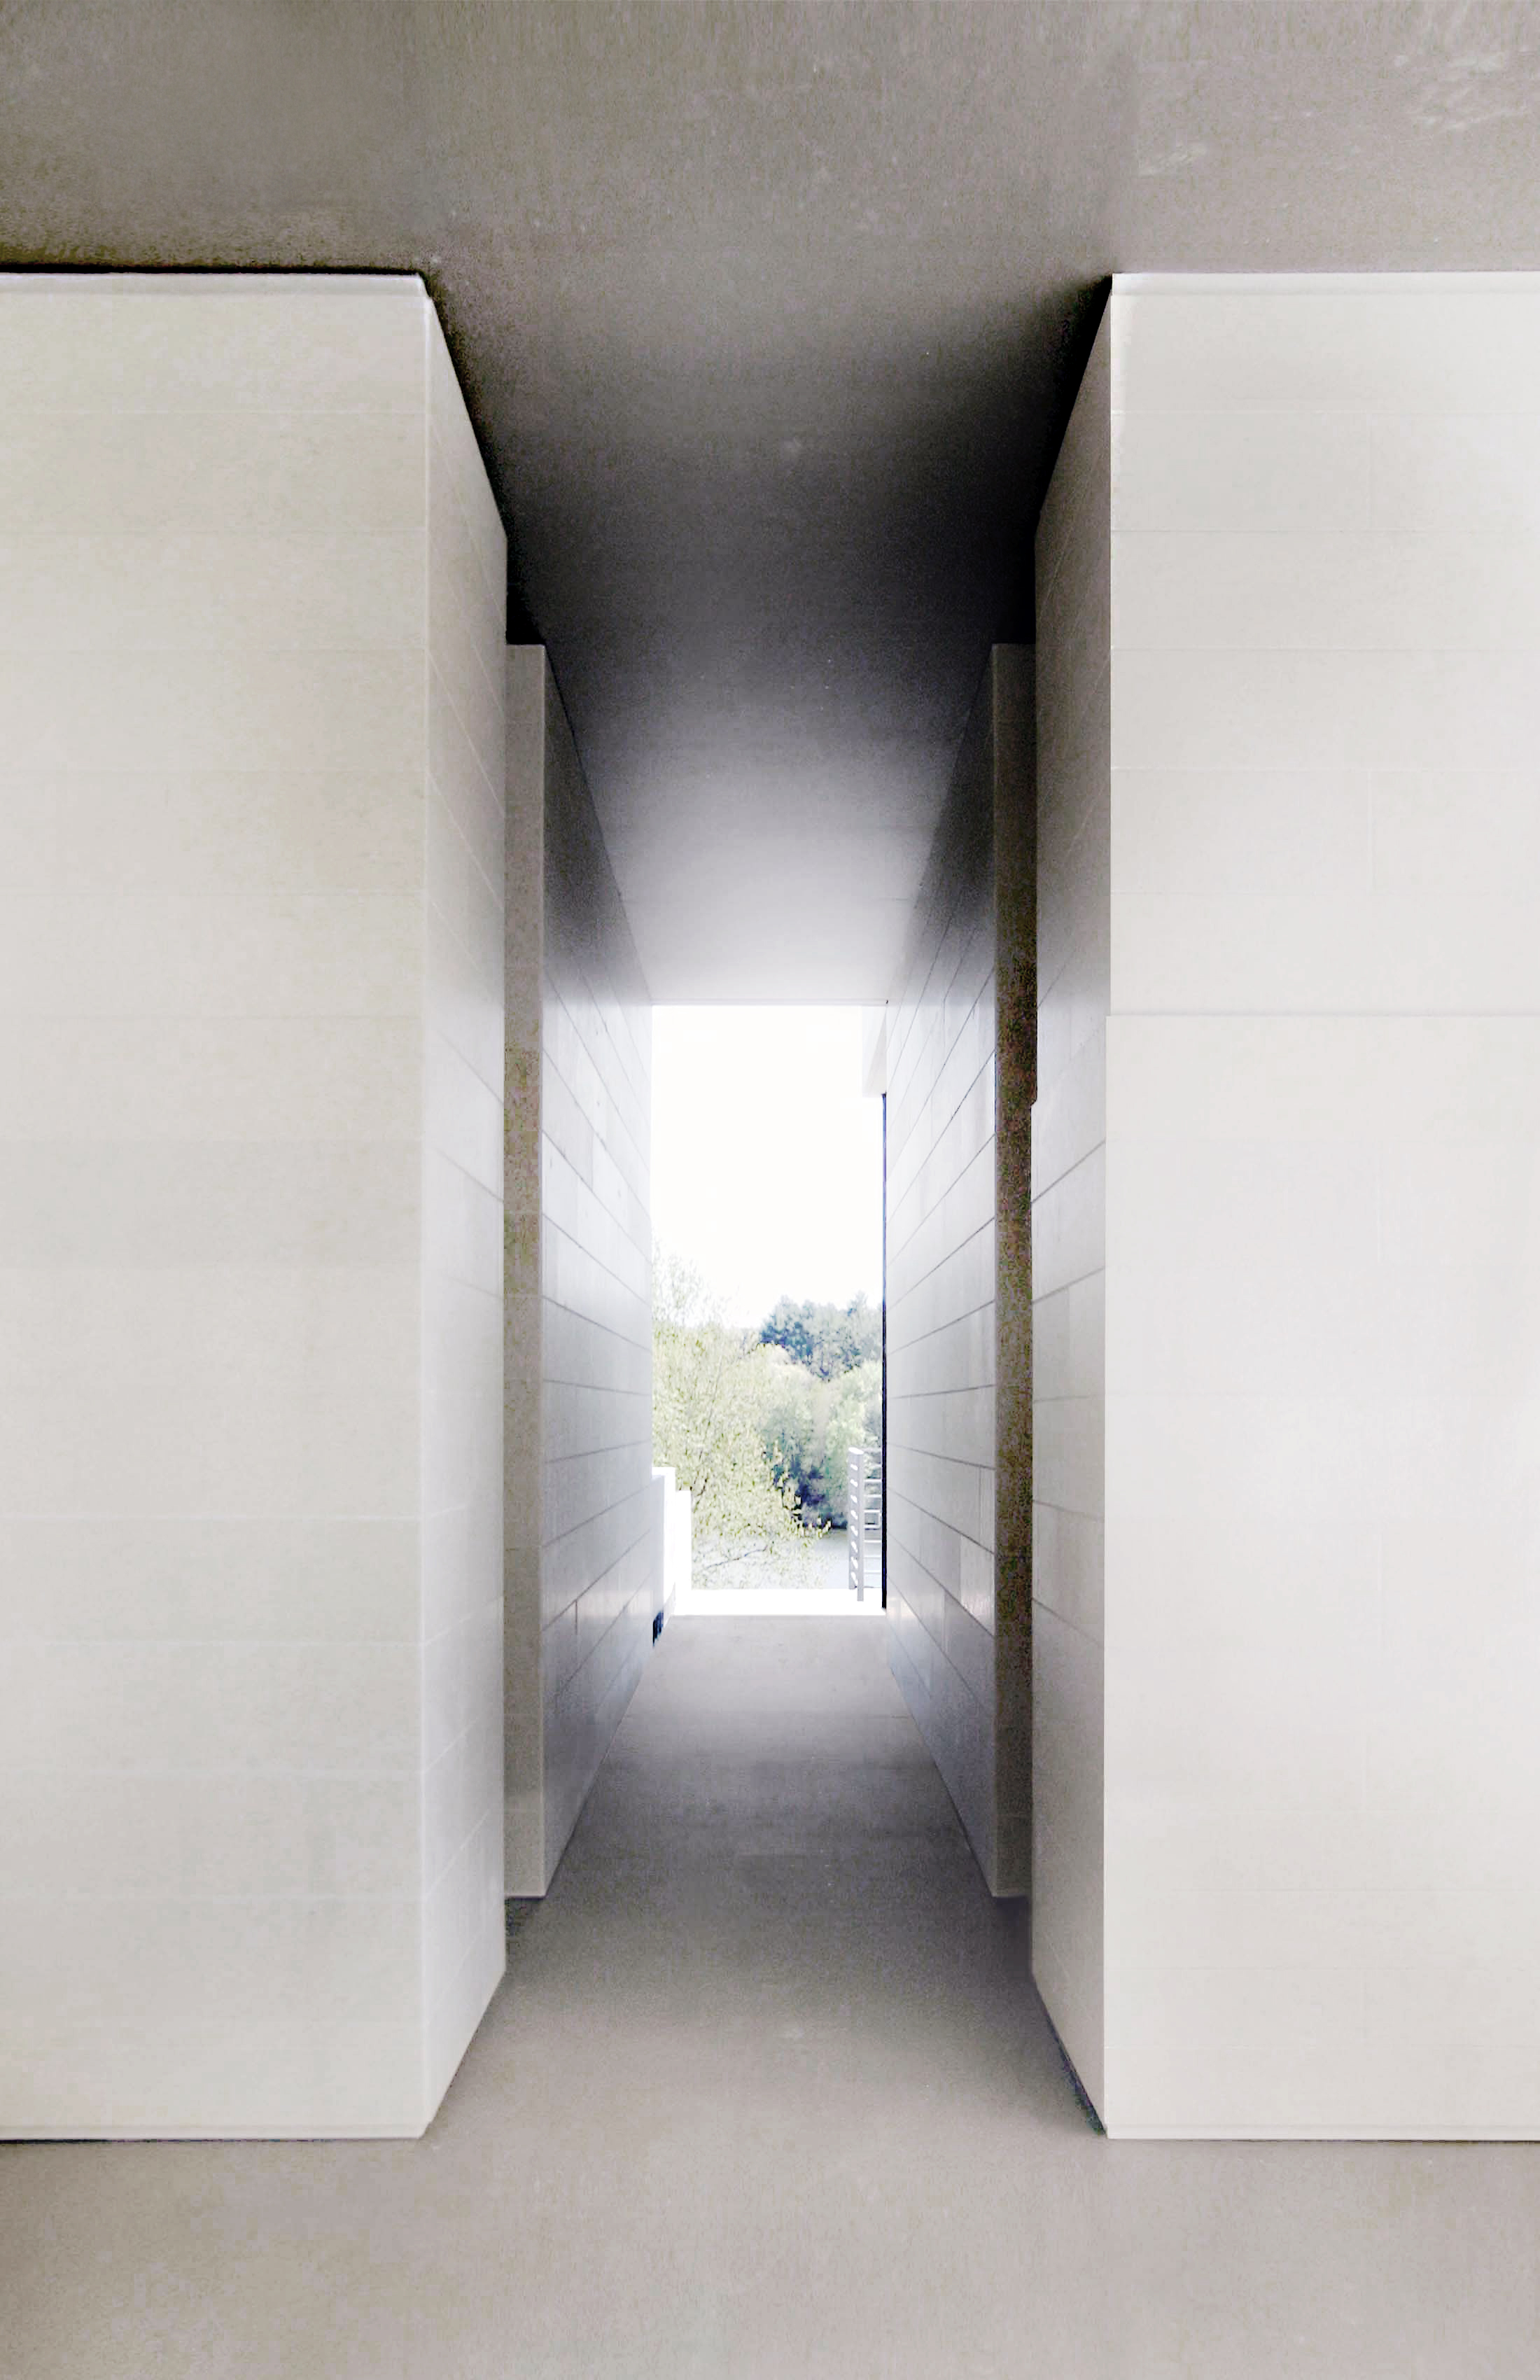 Friedman_house_03 interior view.jpg